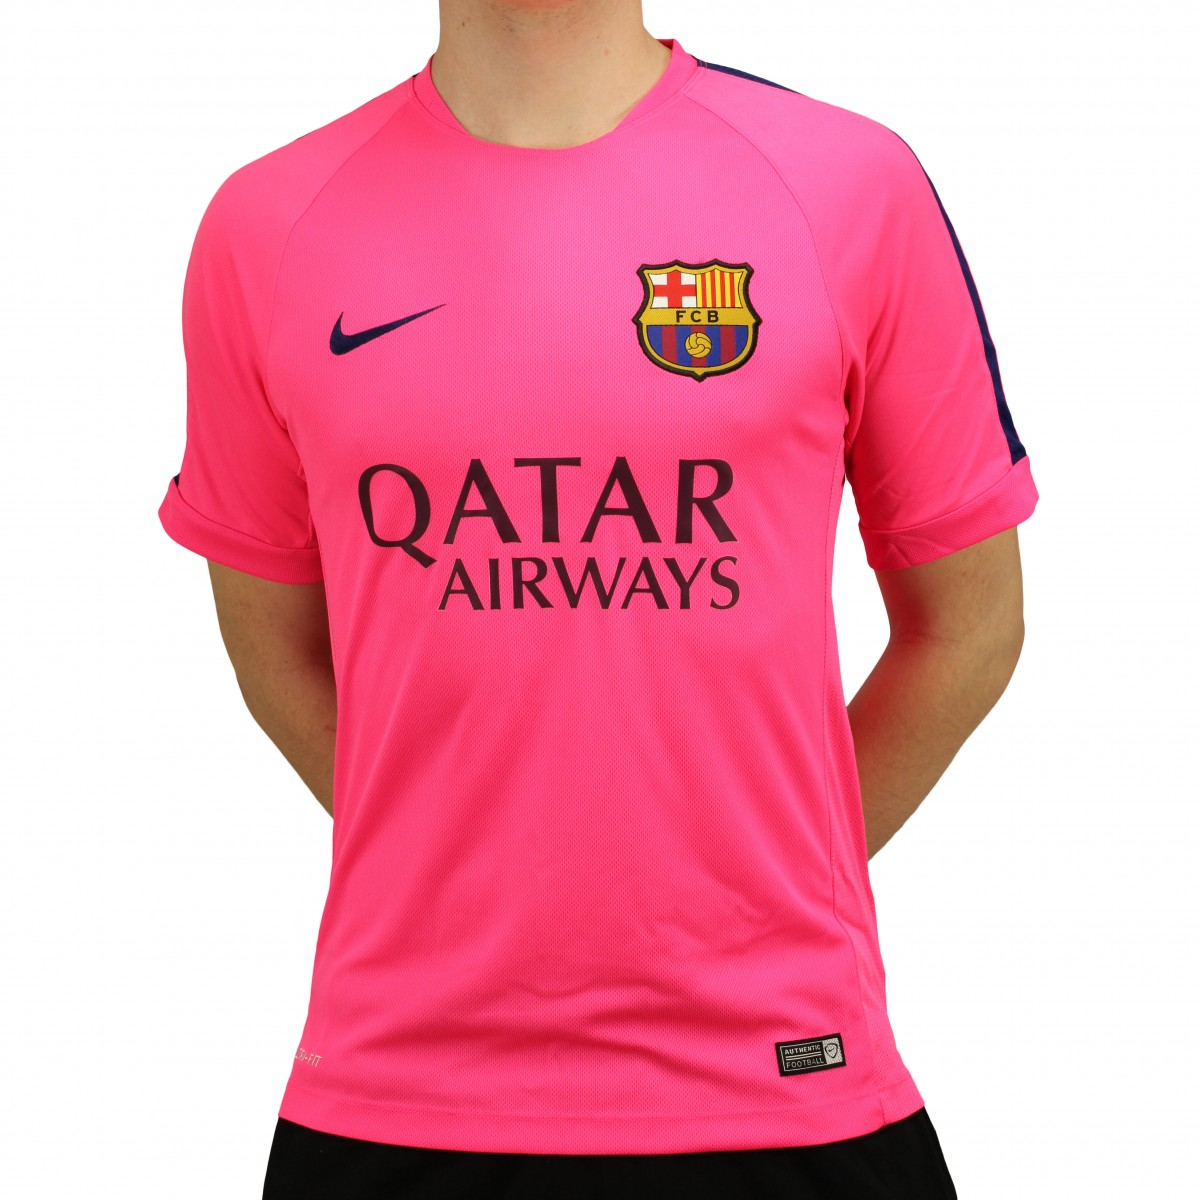 9f187b37051e6 Camisa Nike Barcelona Treino 2014